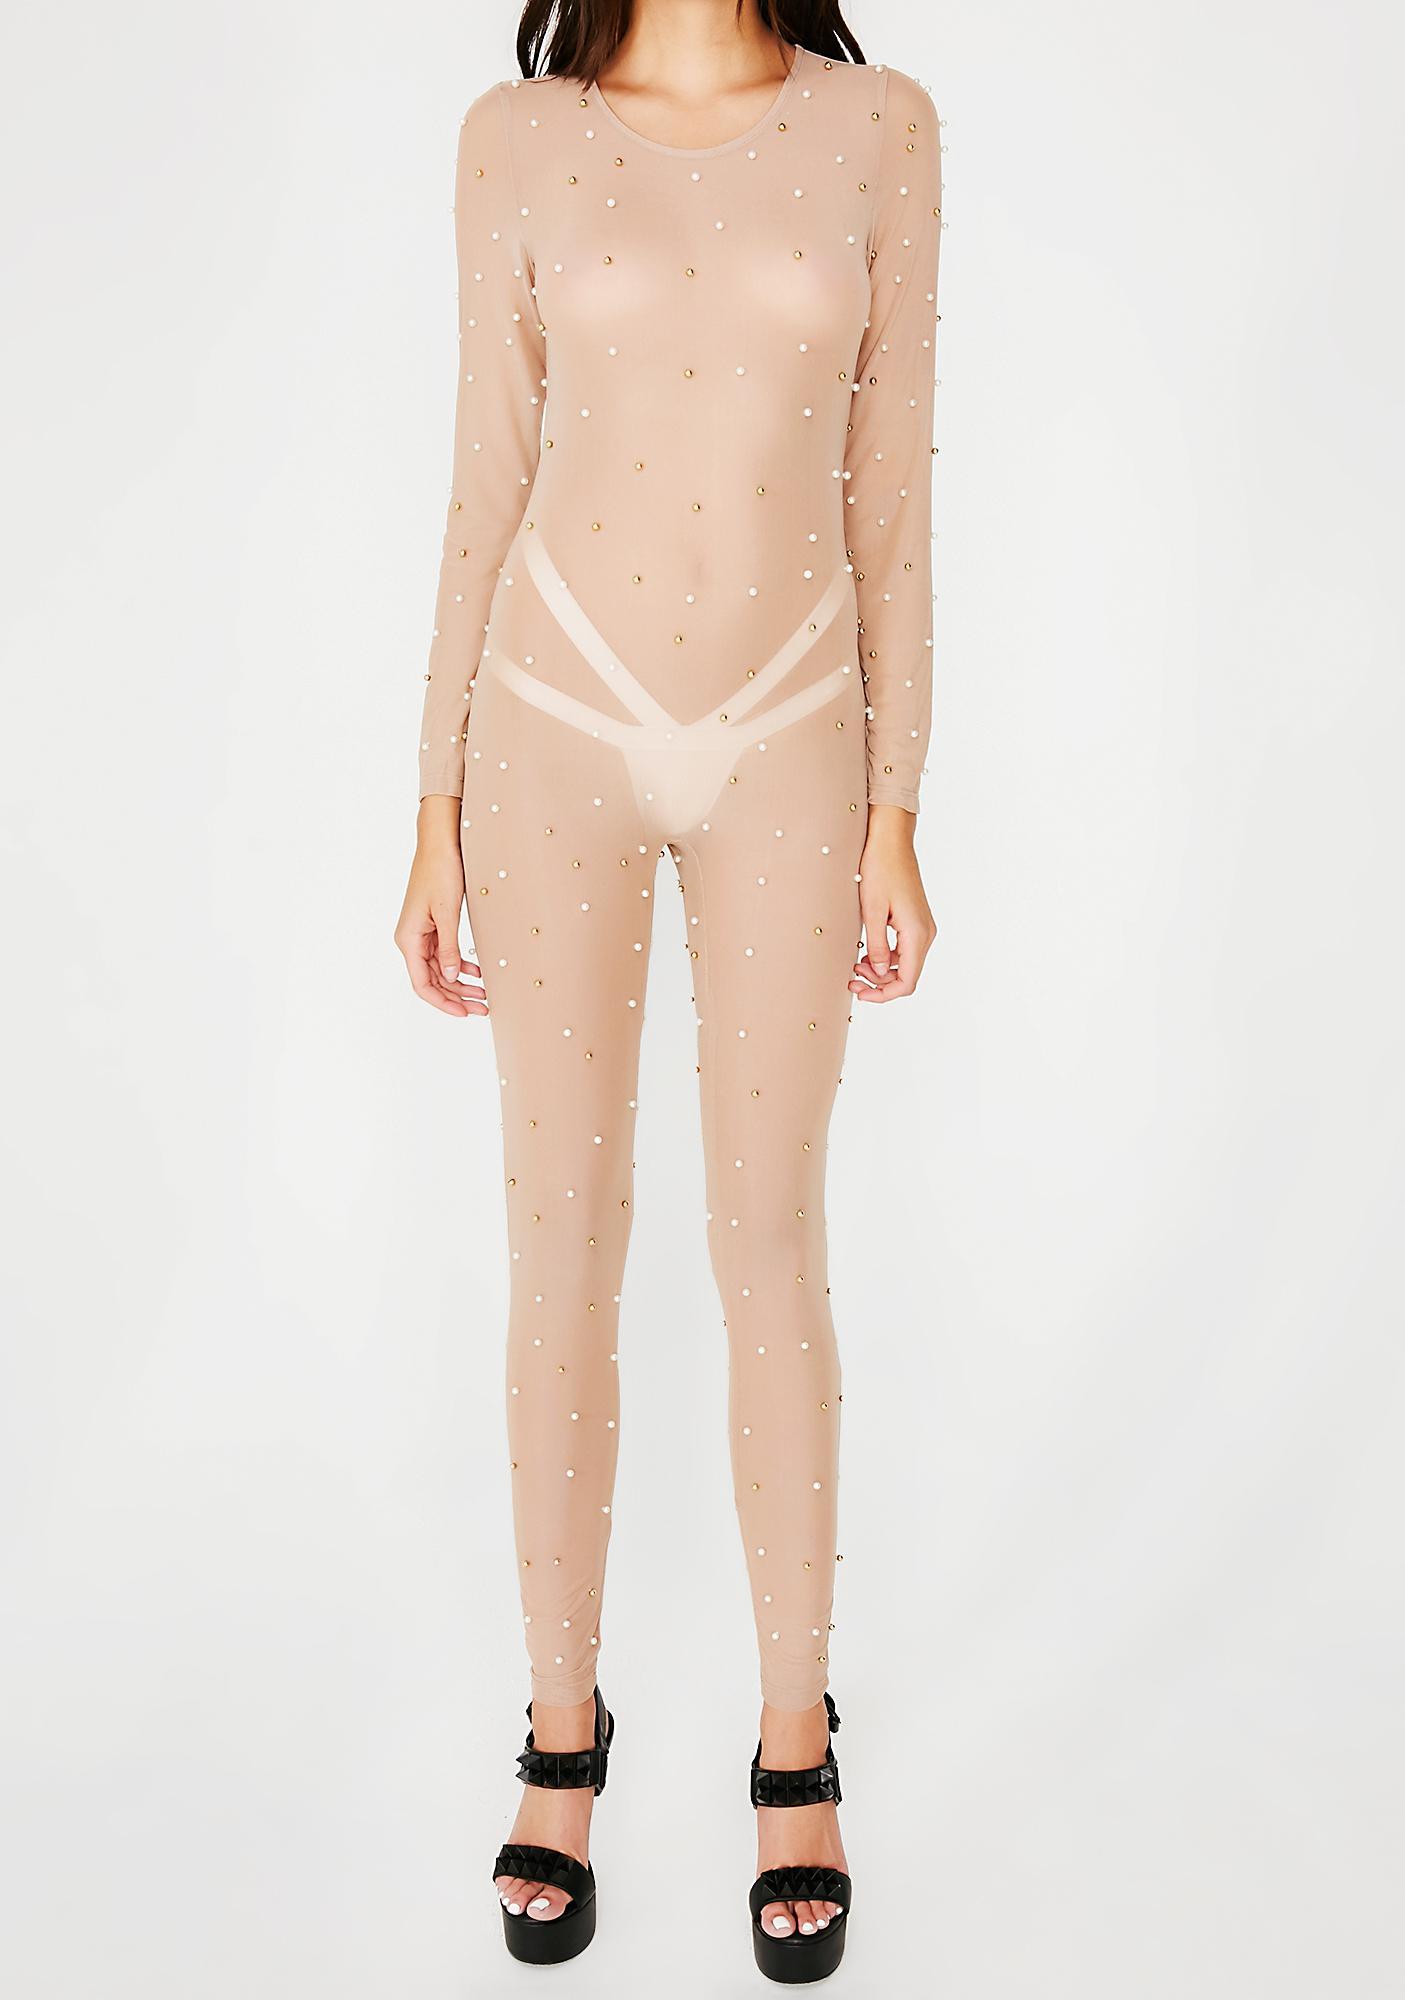 Birthday Suit Sheer Catsuit